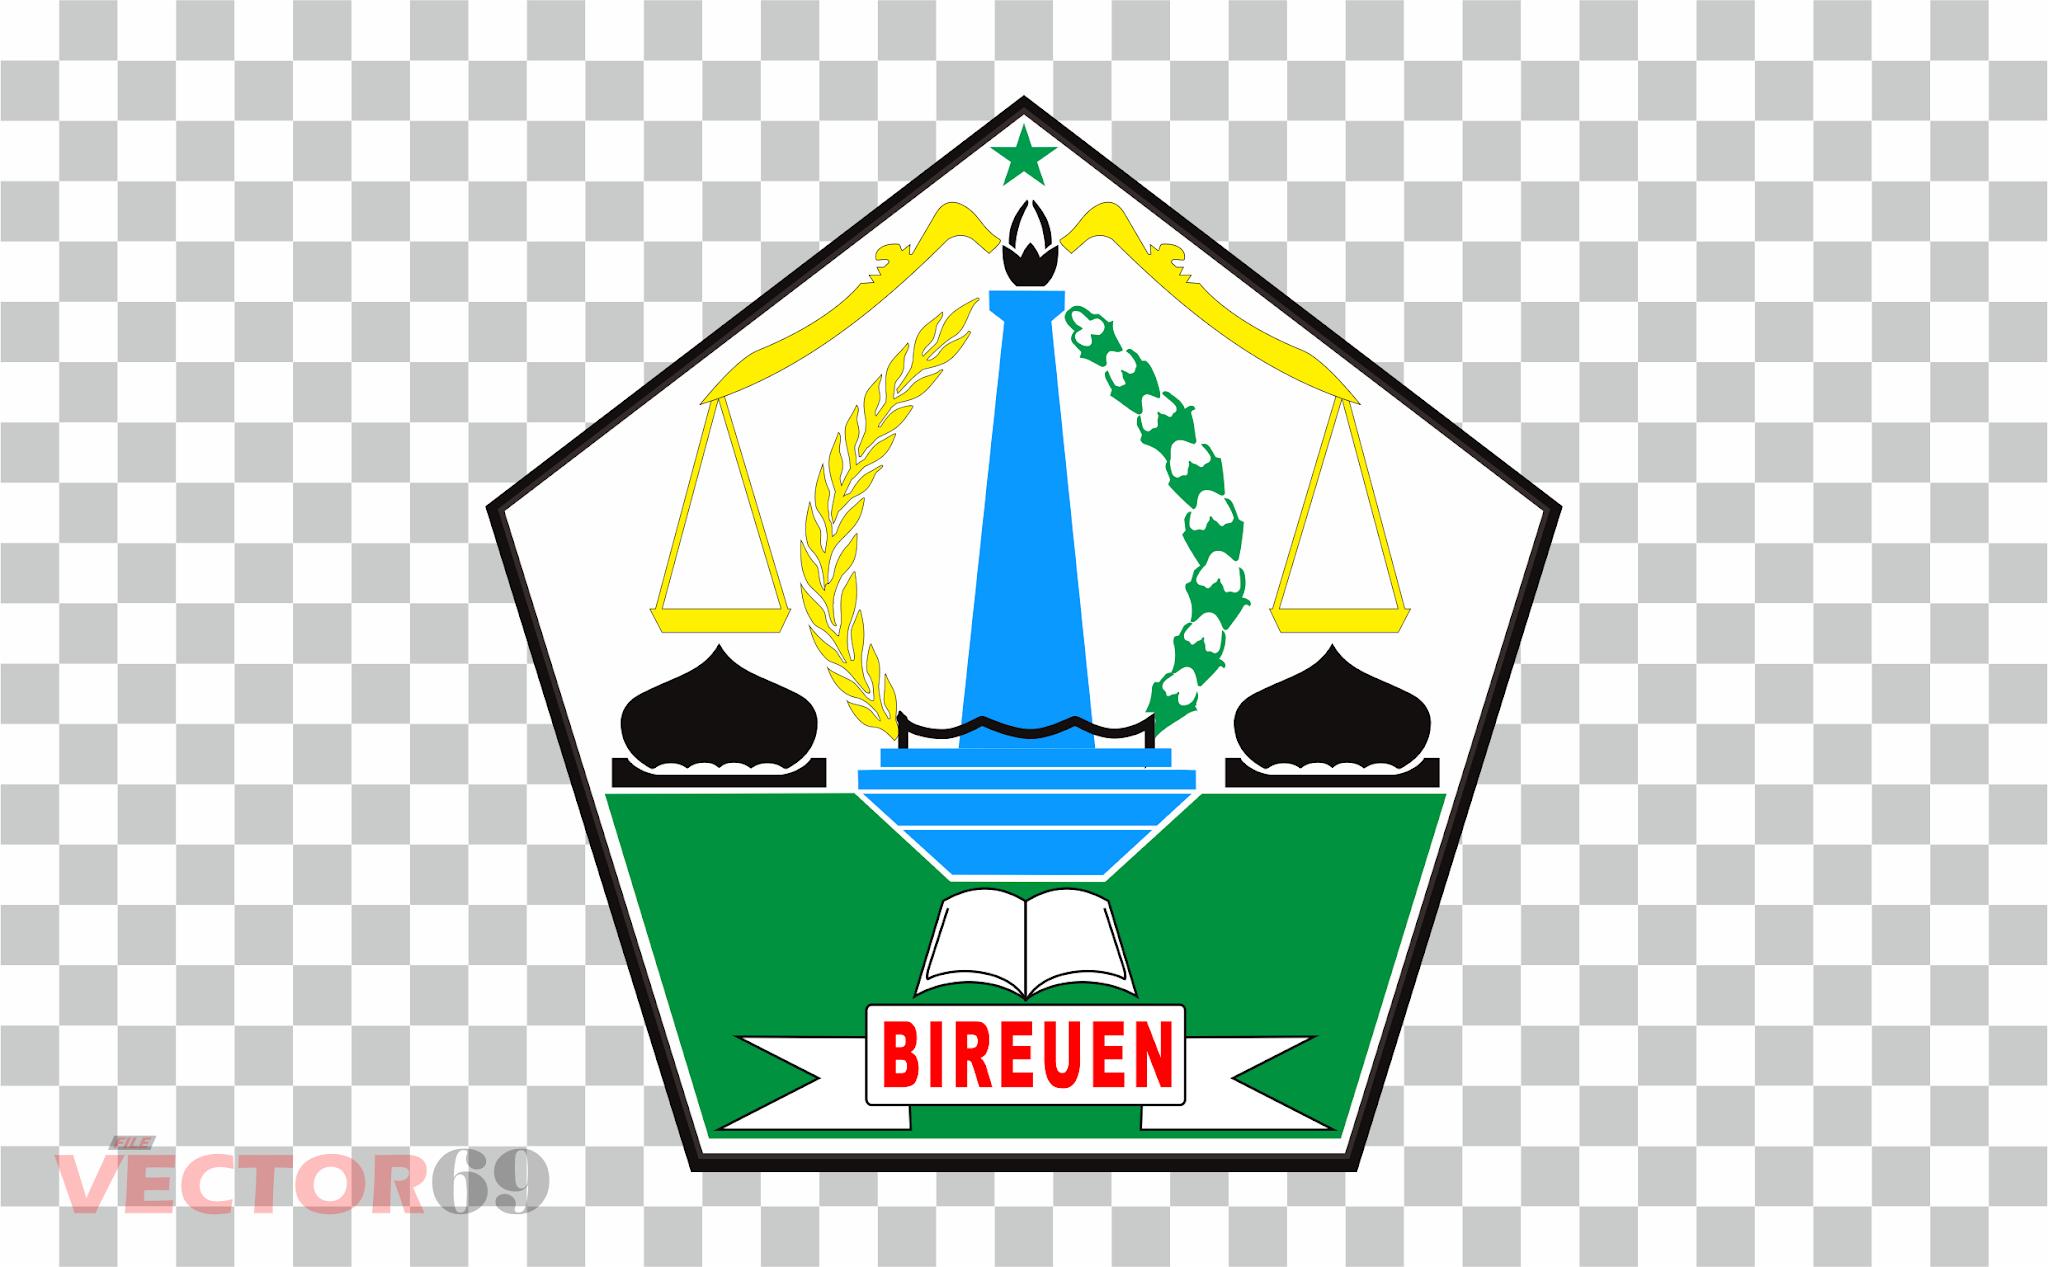 Kabupaten Bireuen Logo - Download Vector File PNG (Portable Network Graphics)